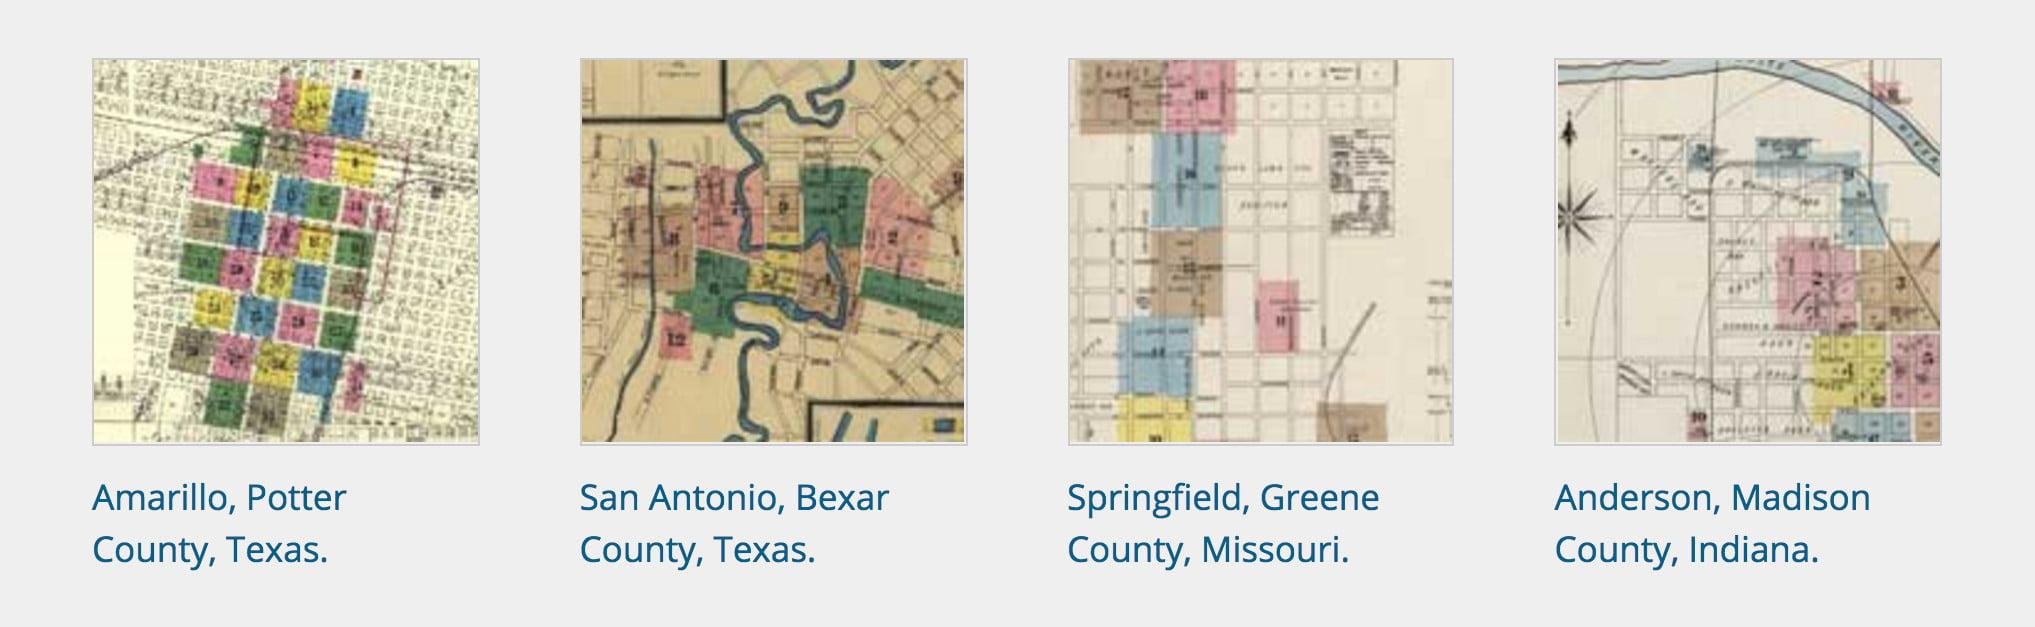 Predominant US Surnames Map Sassy Jane Genealogy - Interactive us surnames map